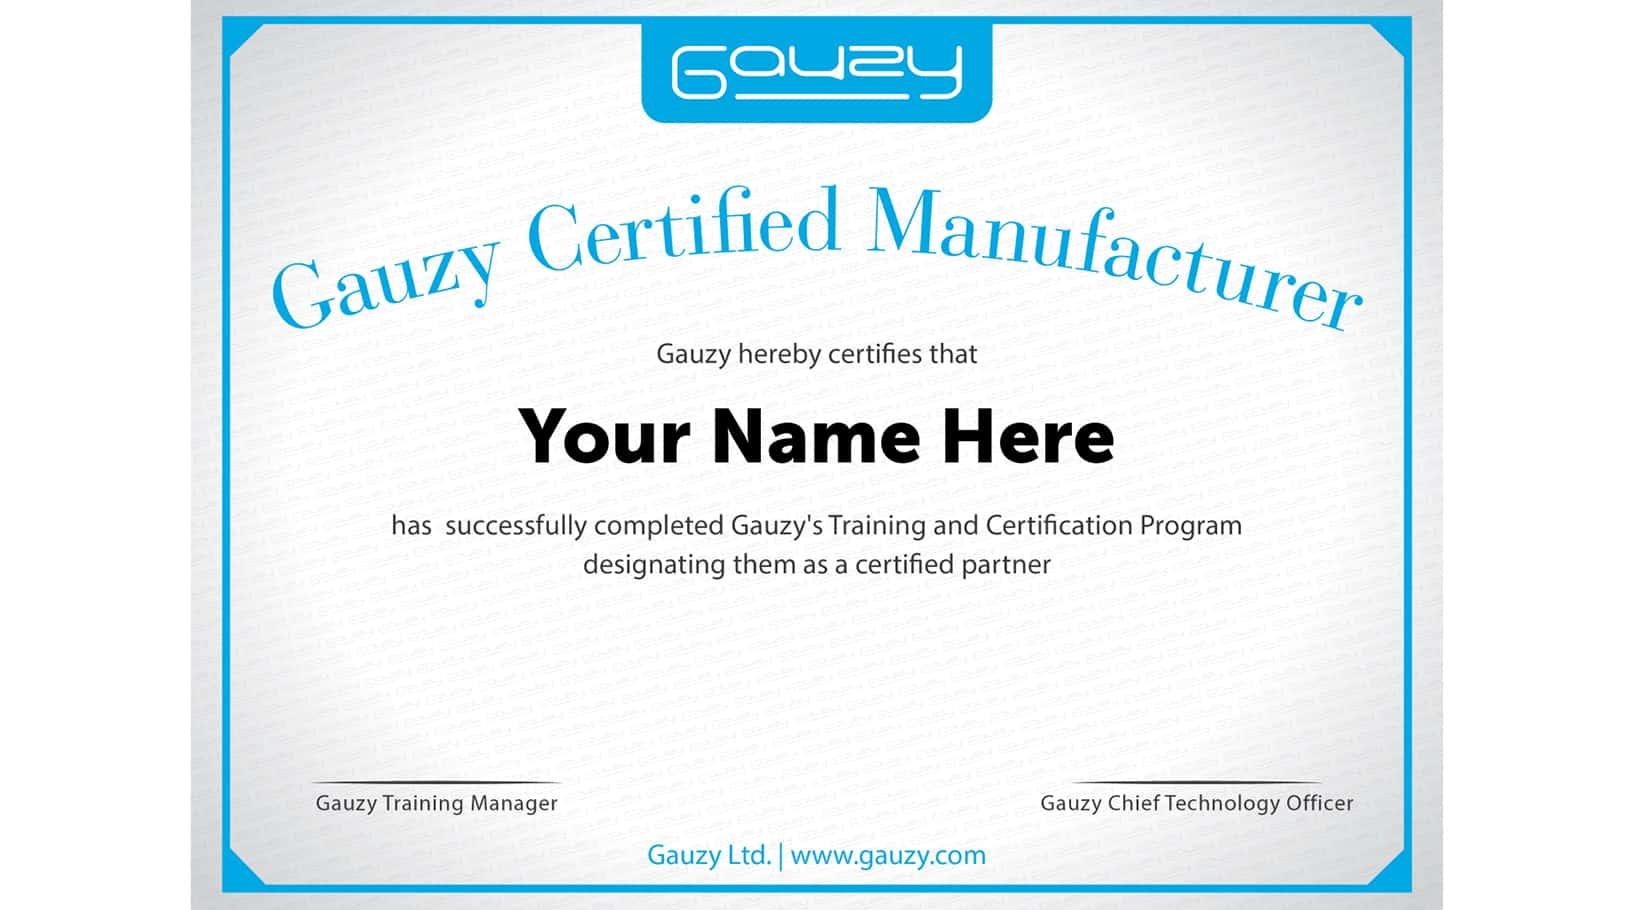 gauzy certificate